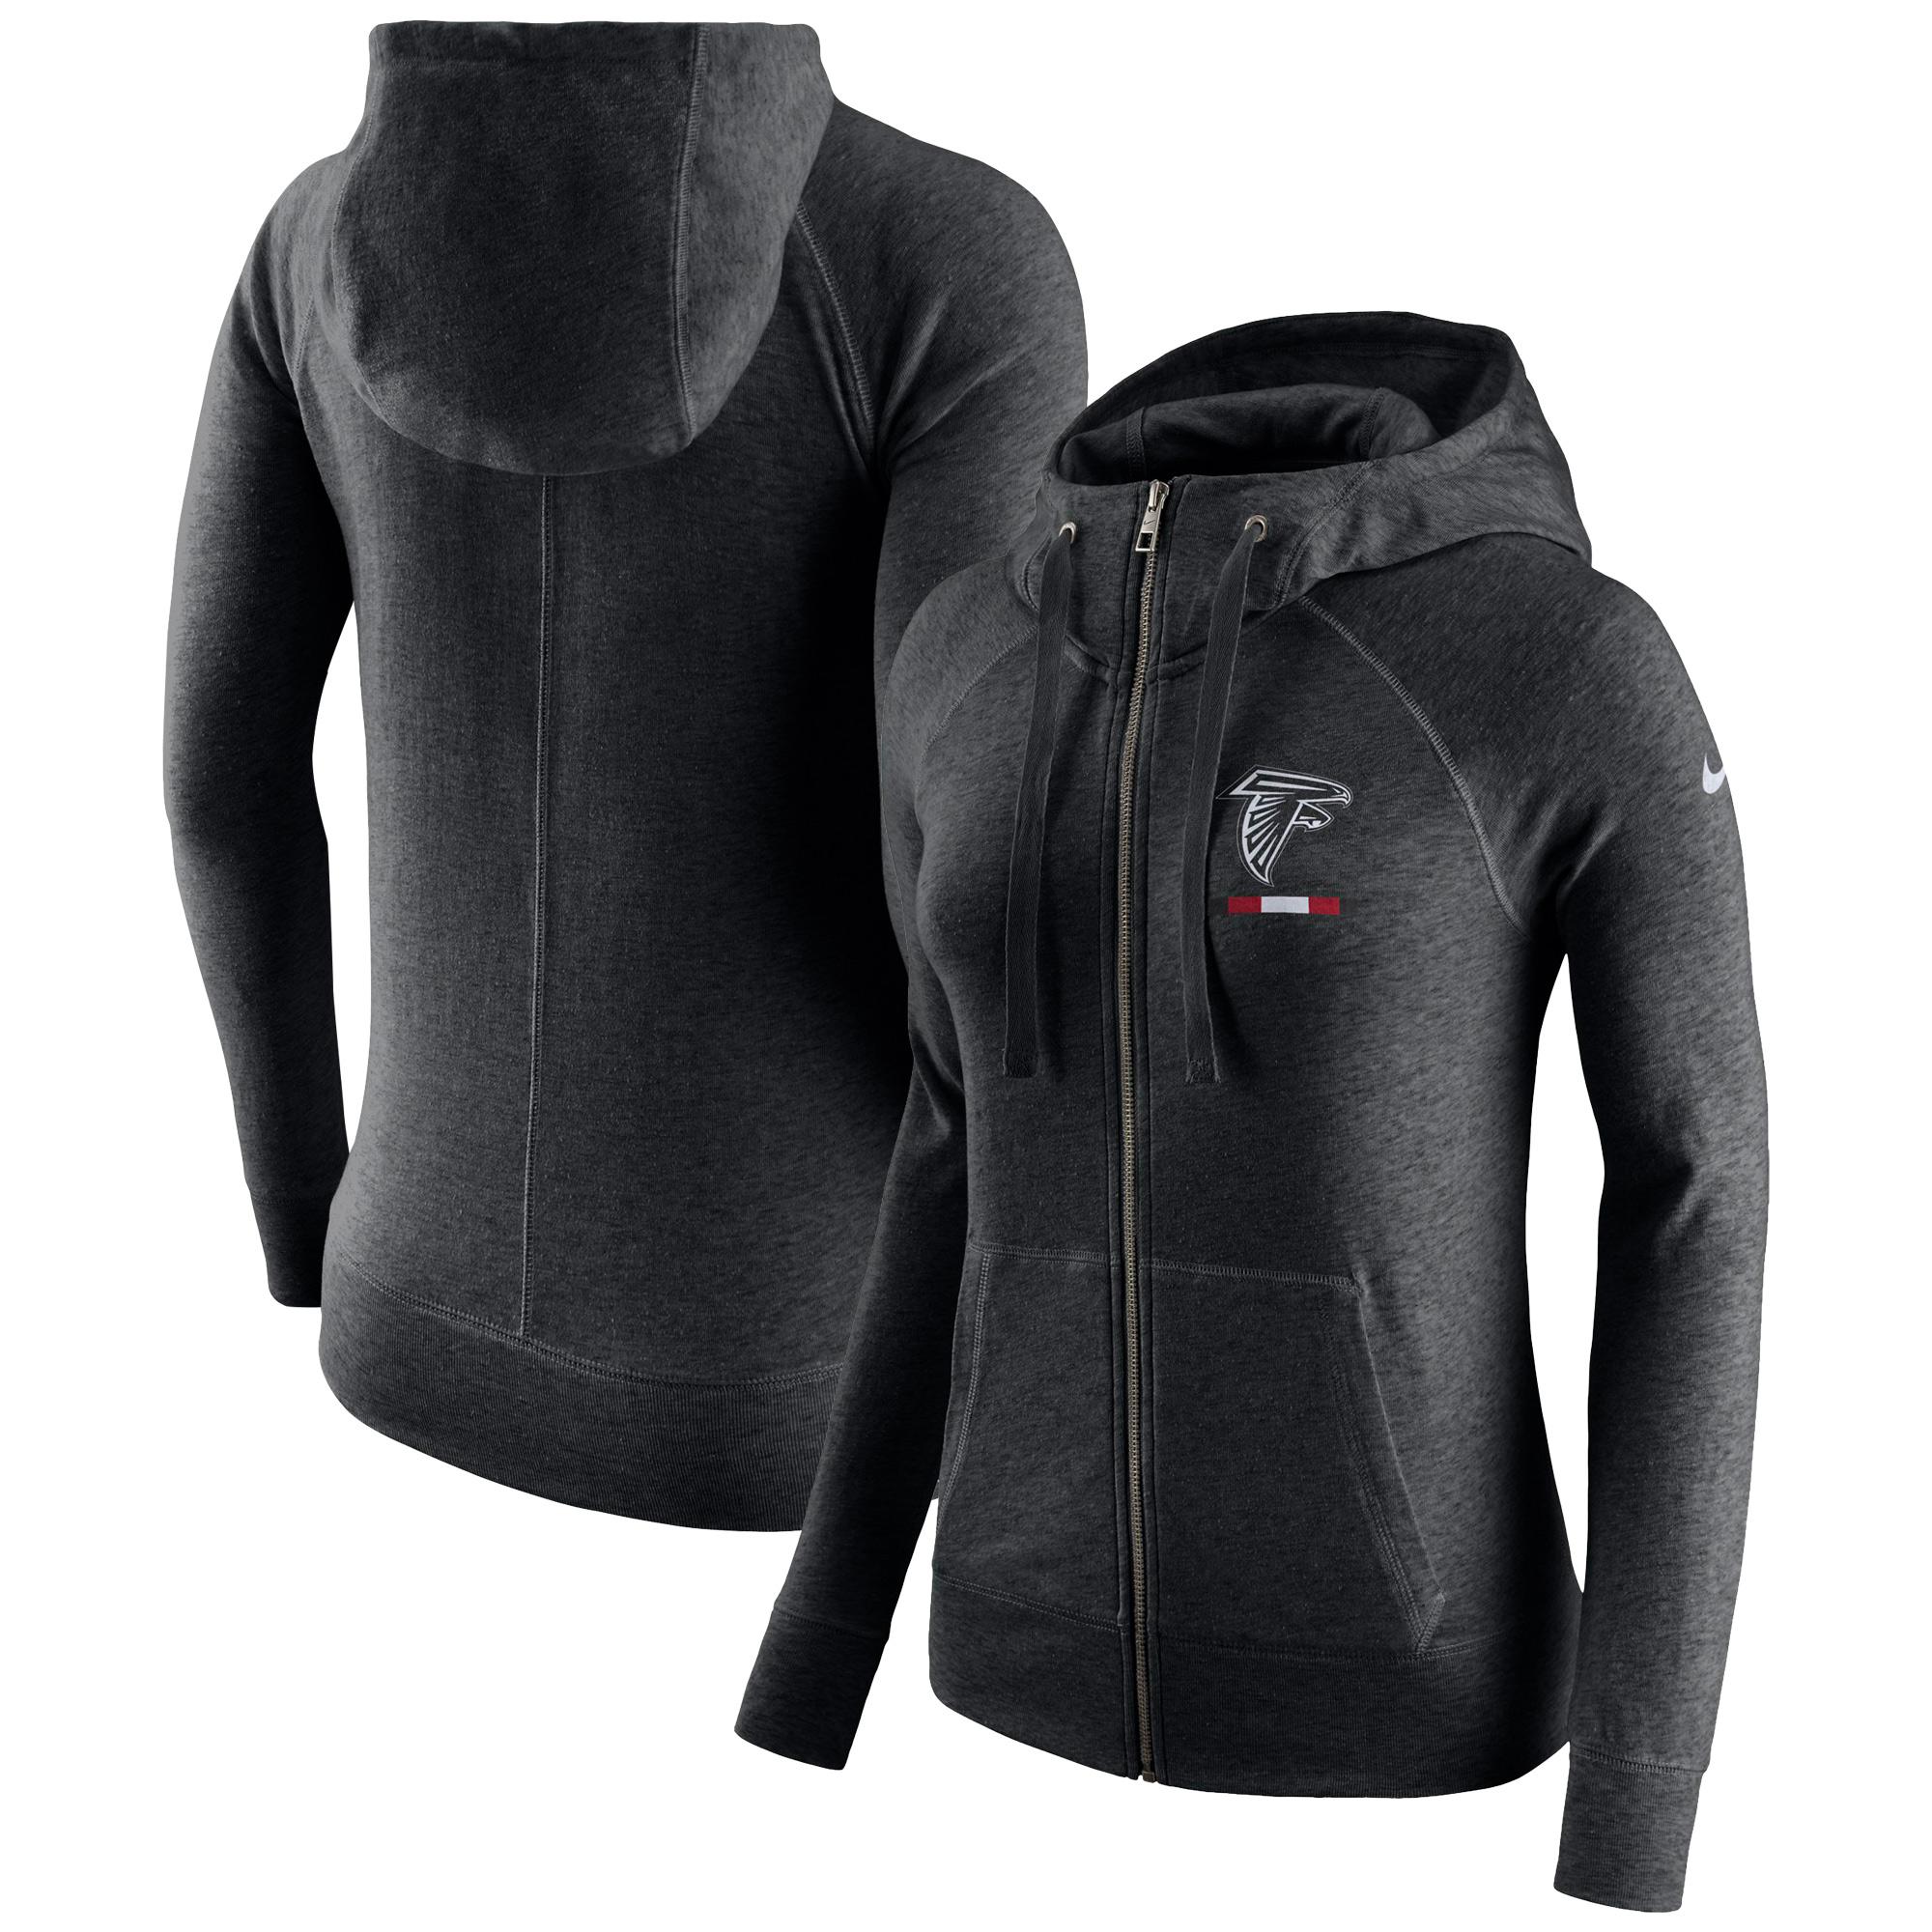 nike women s atlanta falcons gym vintage full-zip black hoodie - Walmart.com 1bcd331aed